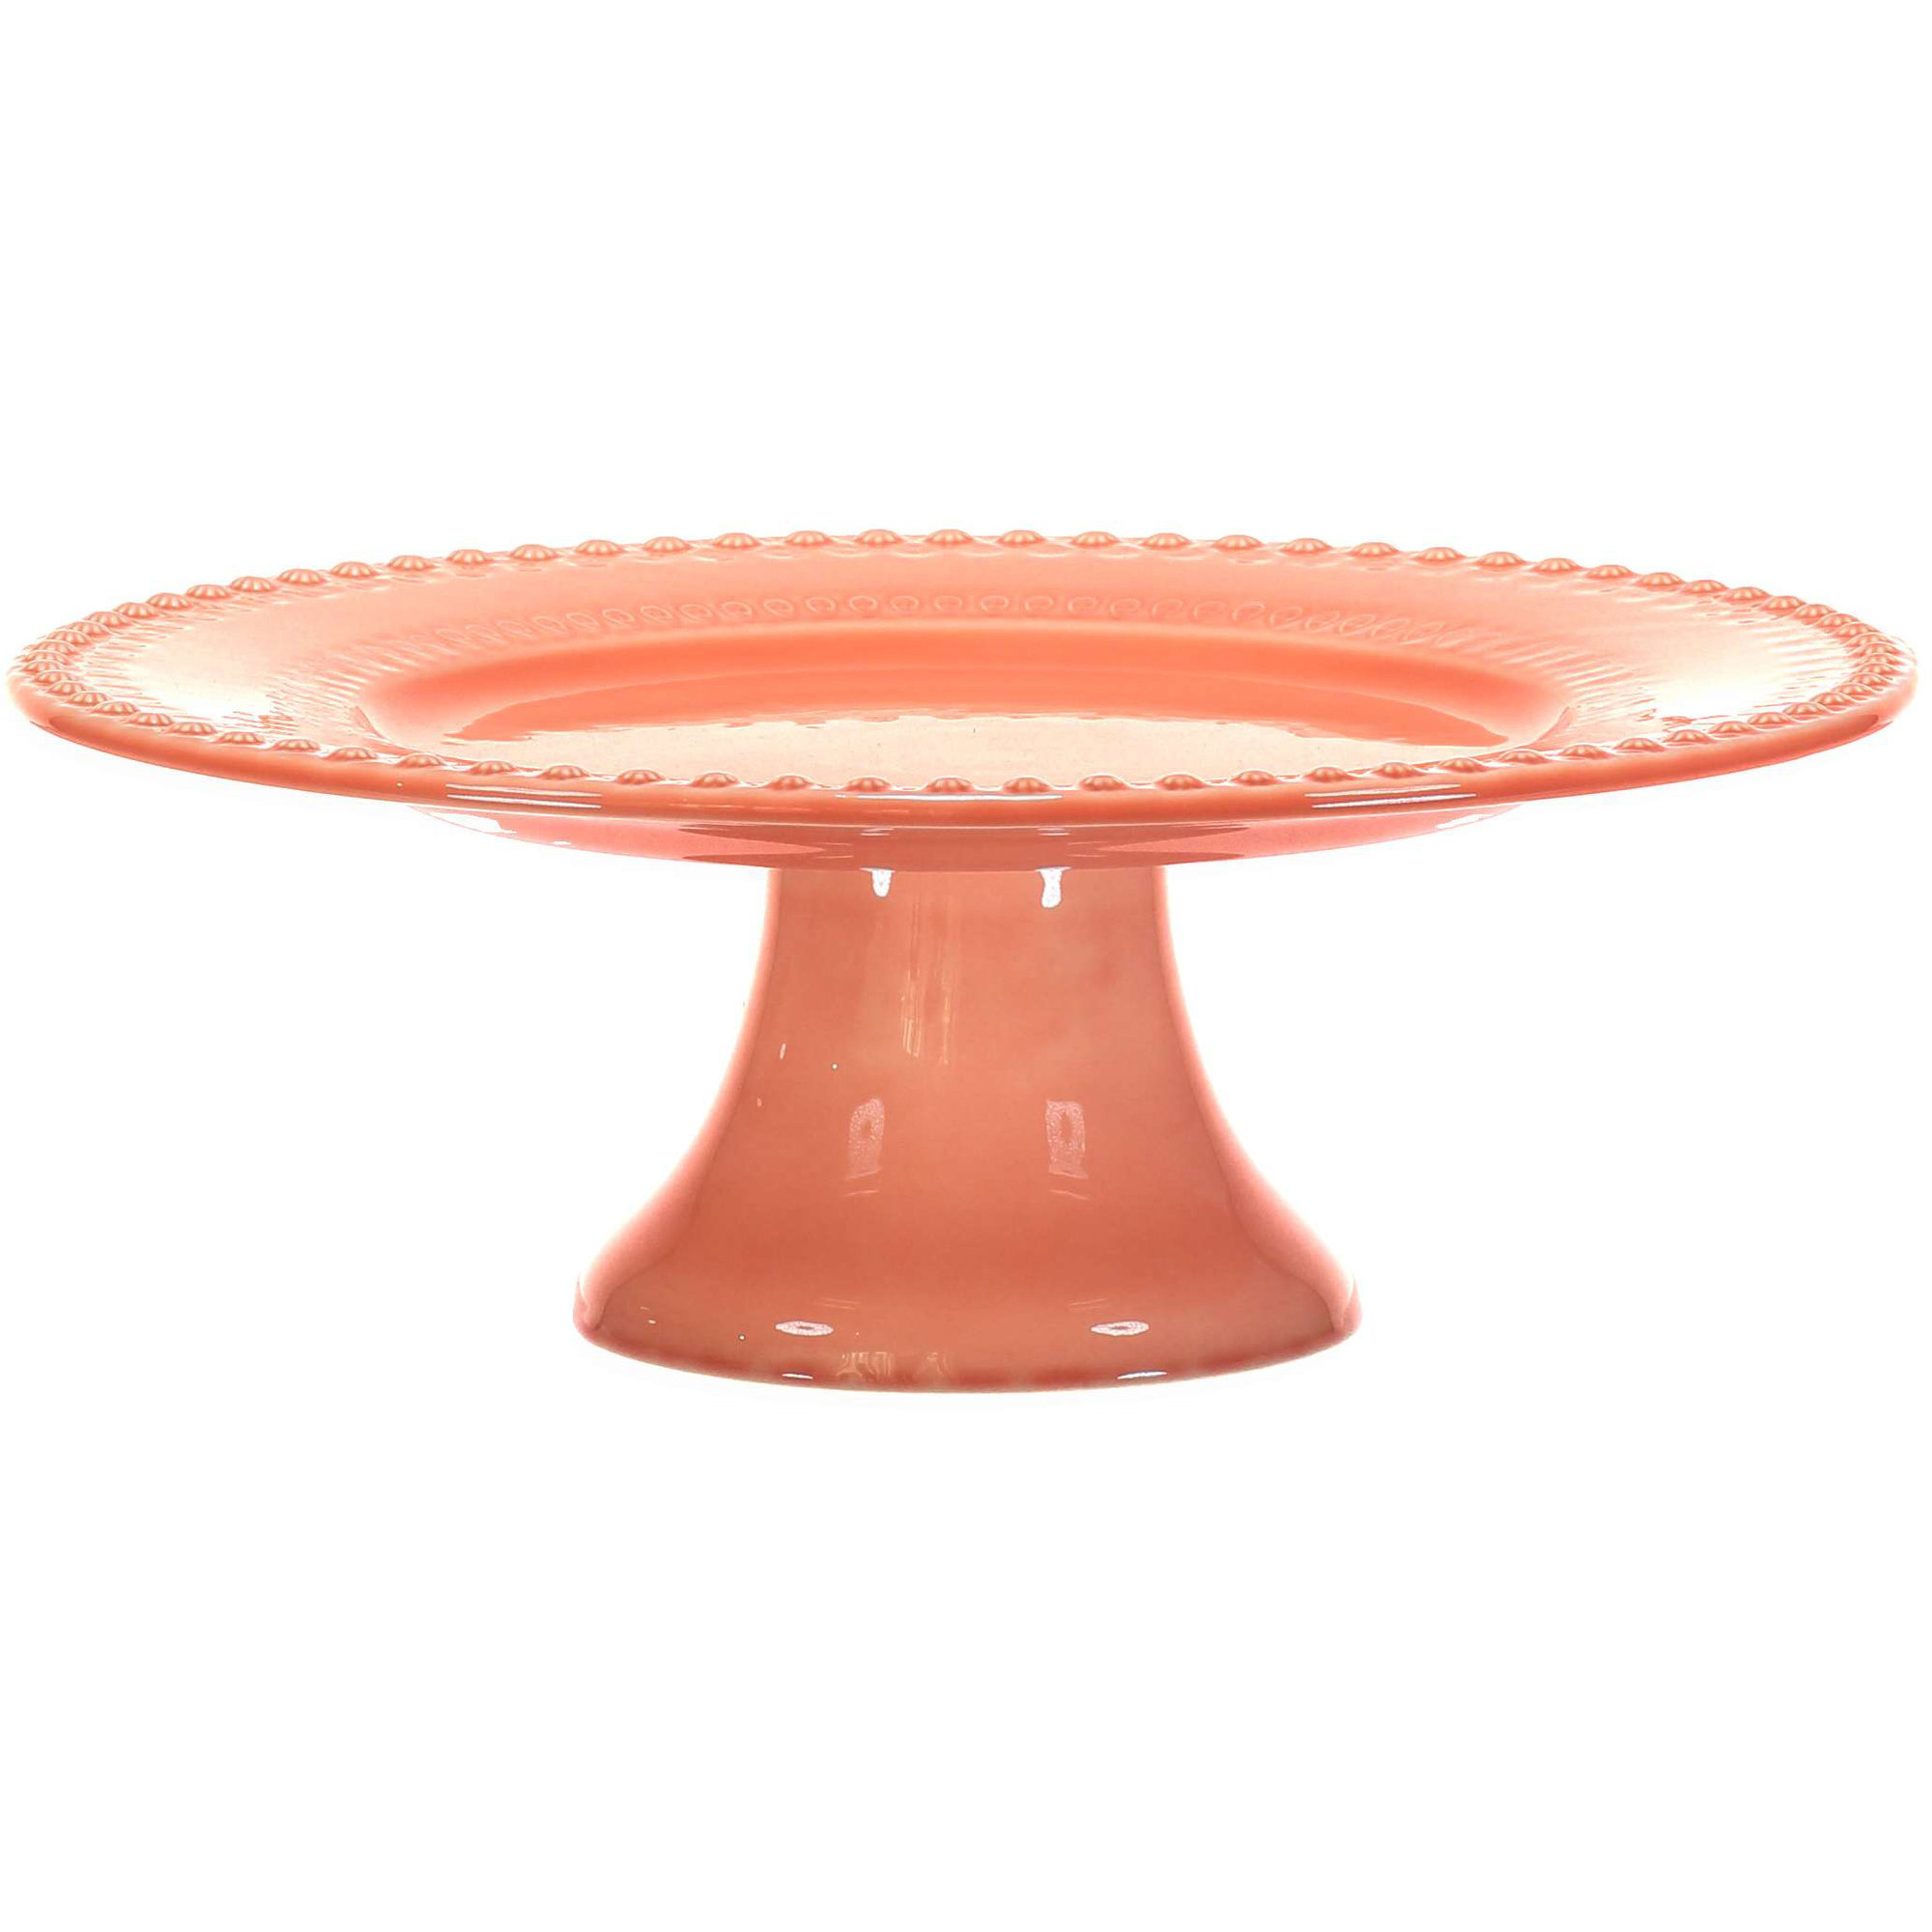 PotteryJo Daisy Tårtfat 35 cm New Tangerine